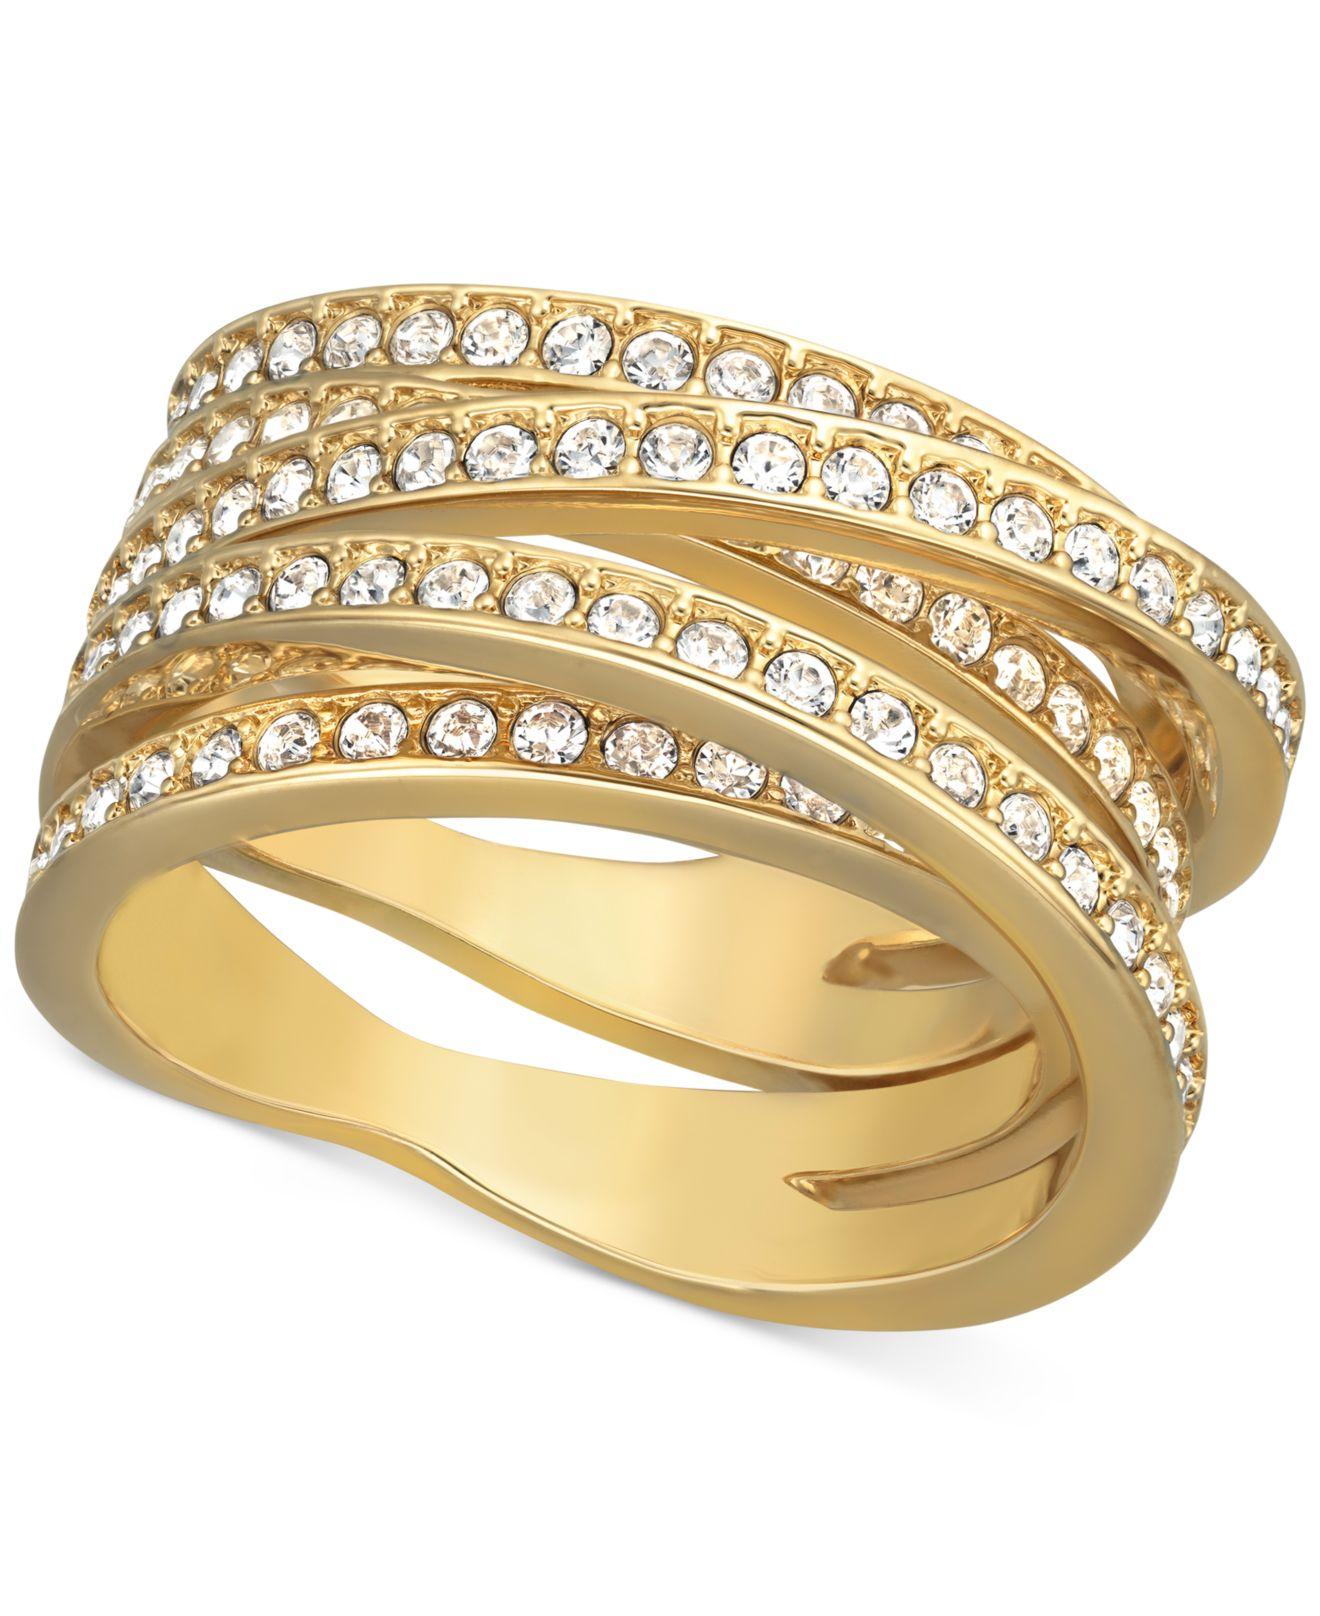 02f1c23abf057 Swarovski Metallic Gold-Tone Spiral Crystal Pave Ring